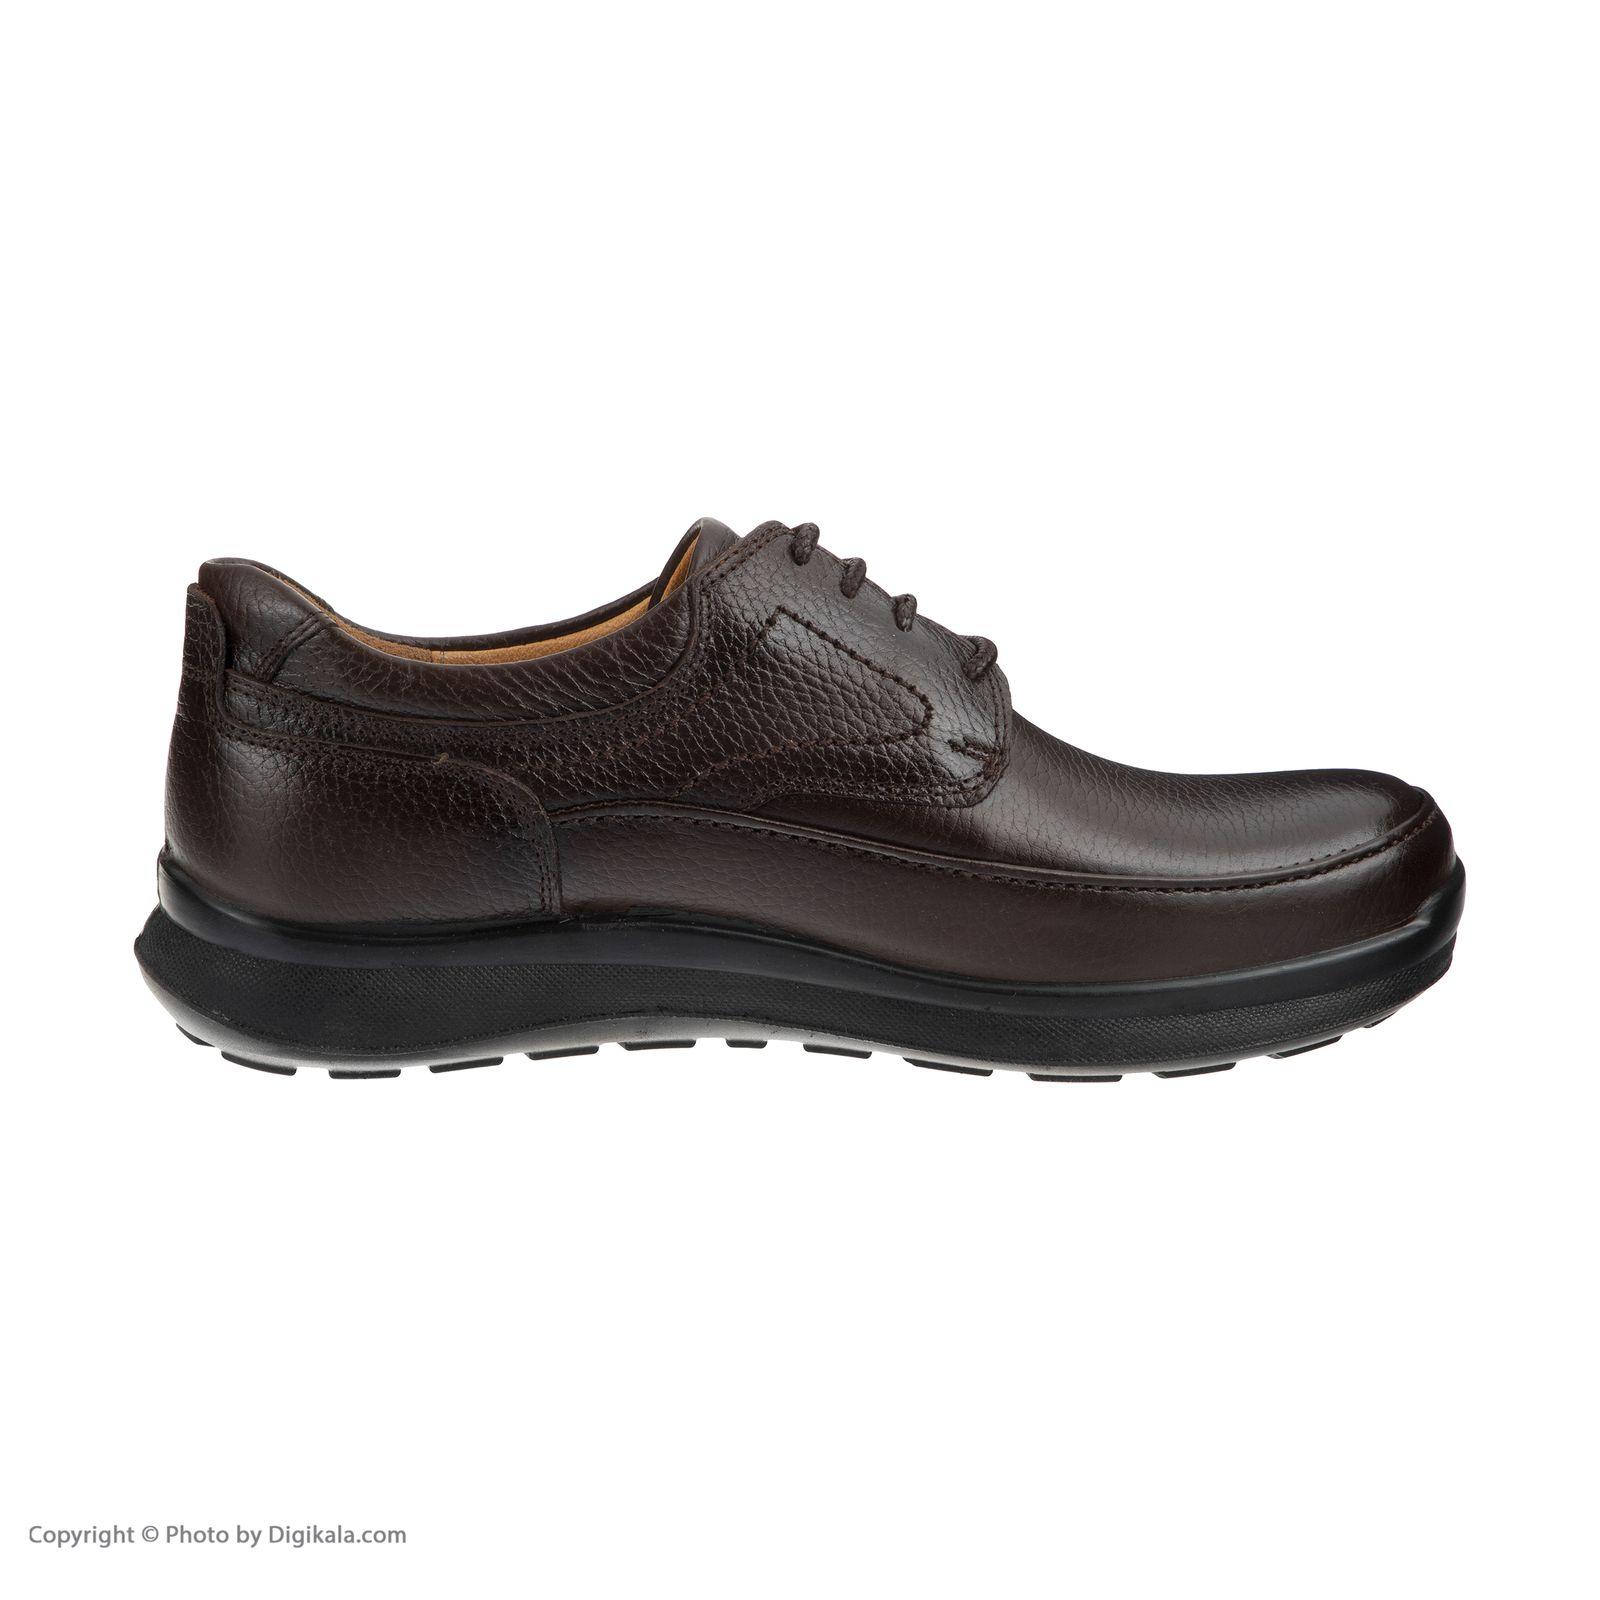 کفش روزمره مردانه بلوط مدل 7266C503104 -  - 8